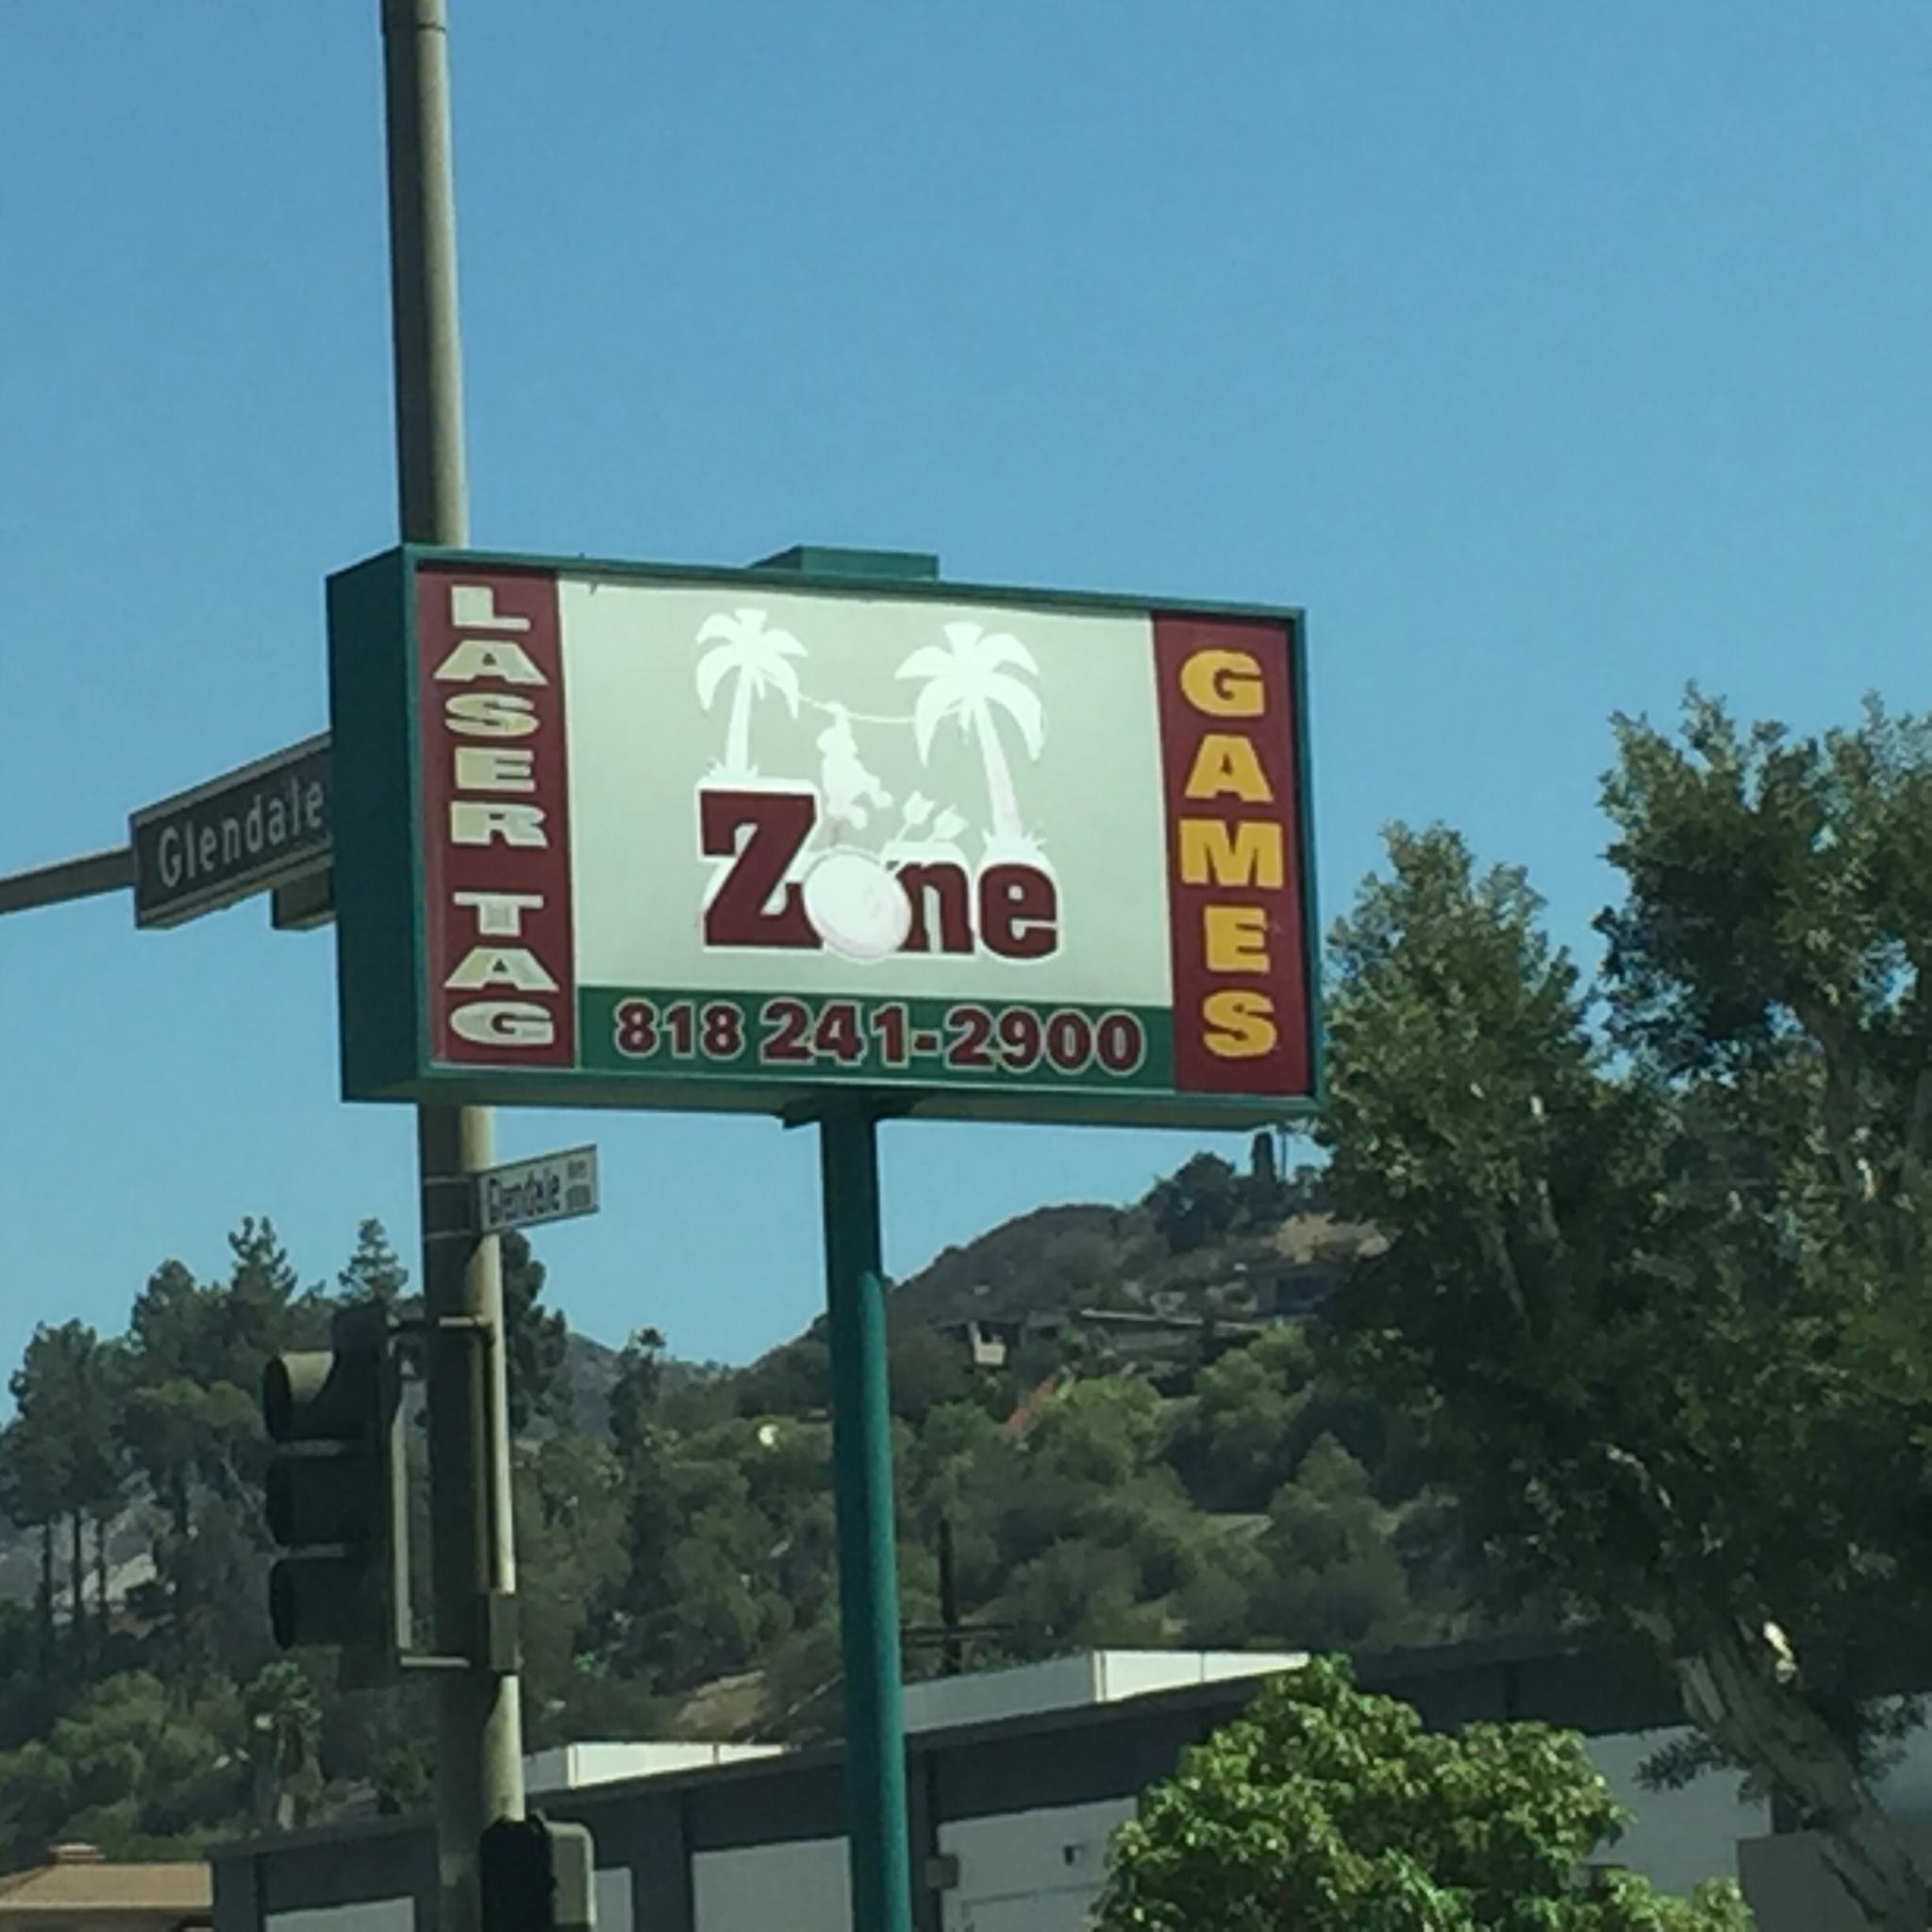 Jungle Zone 826 N Glendale Ave, Glendale, CA 91206 - YP com